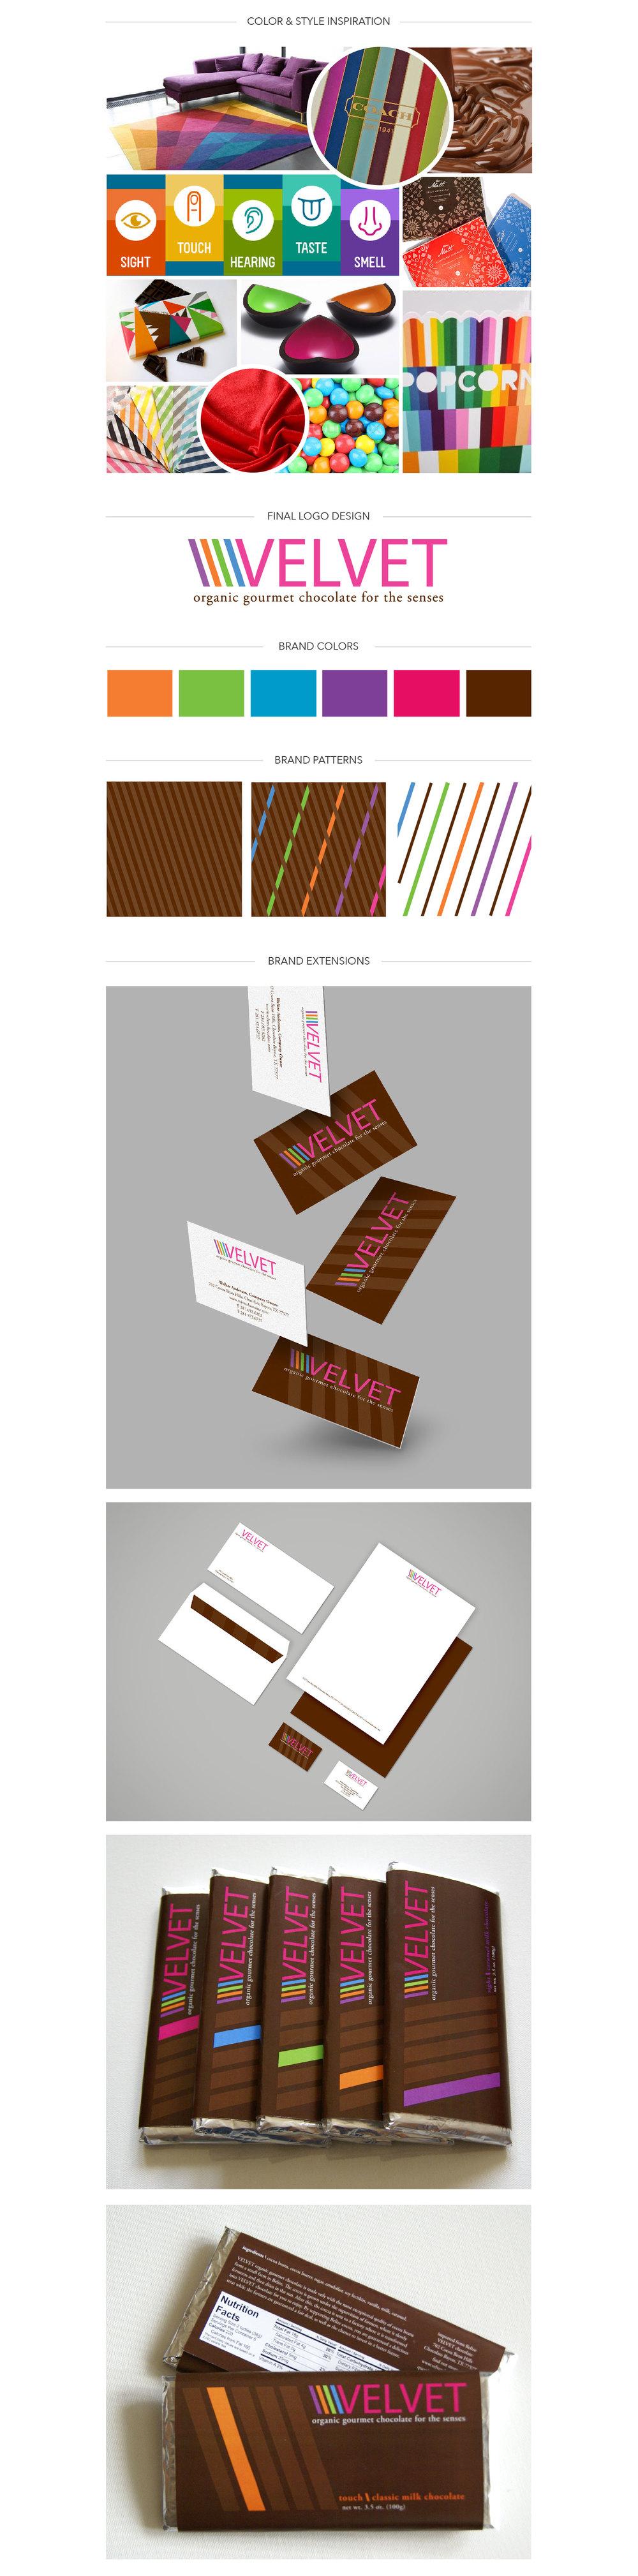 Velvet Chocolate Process-01.jpg